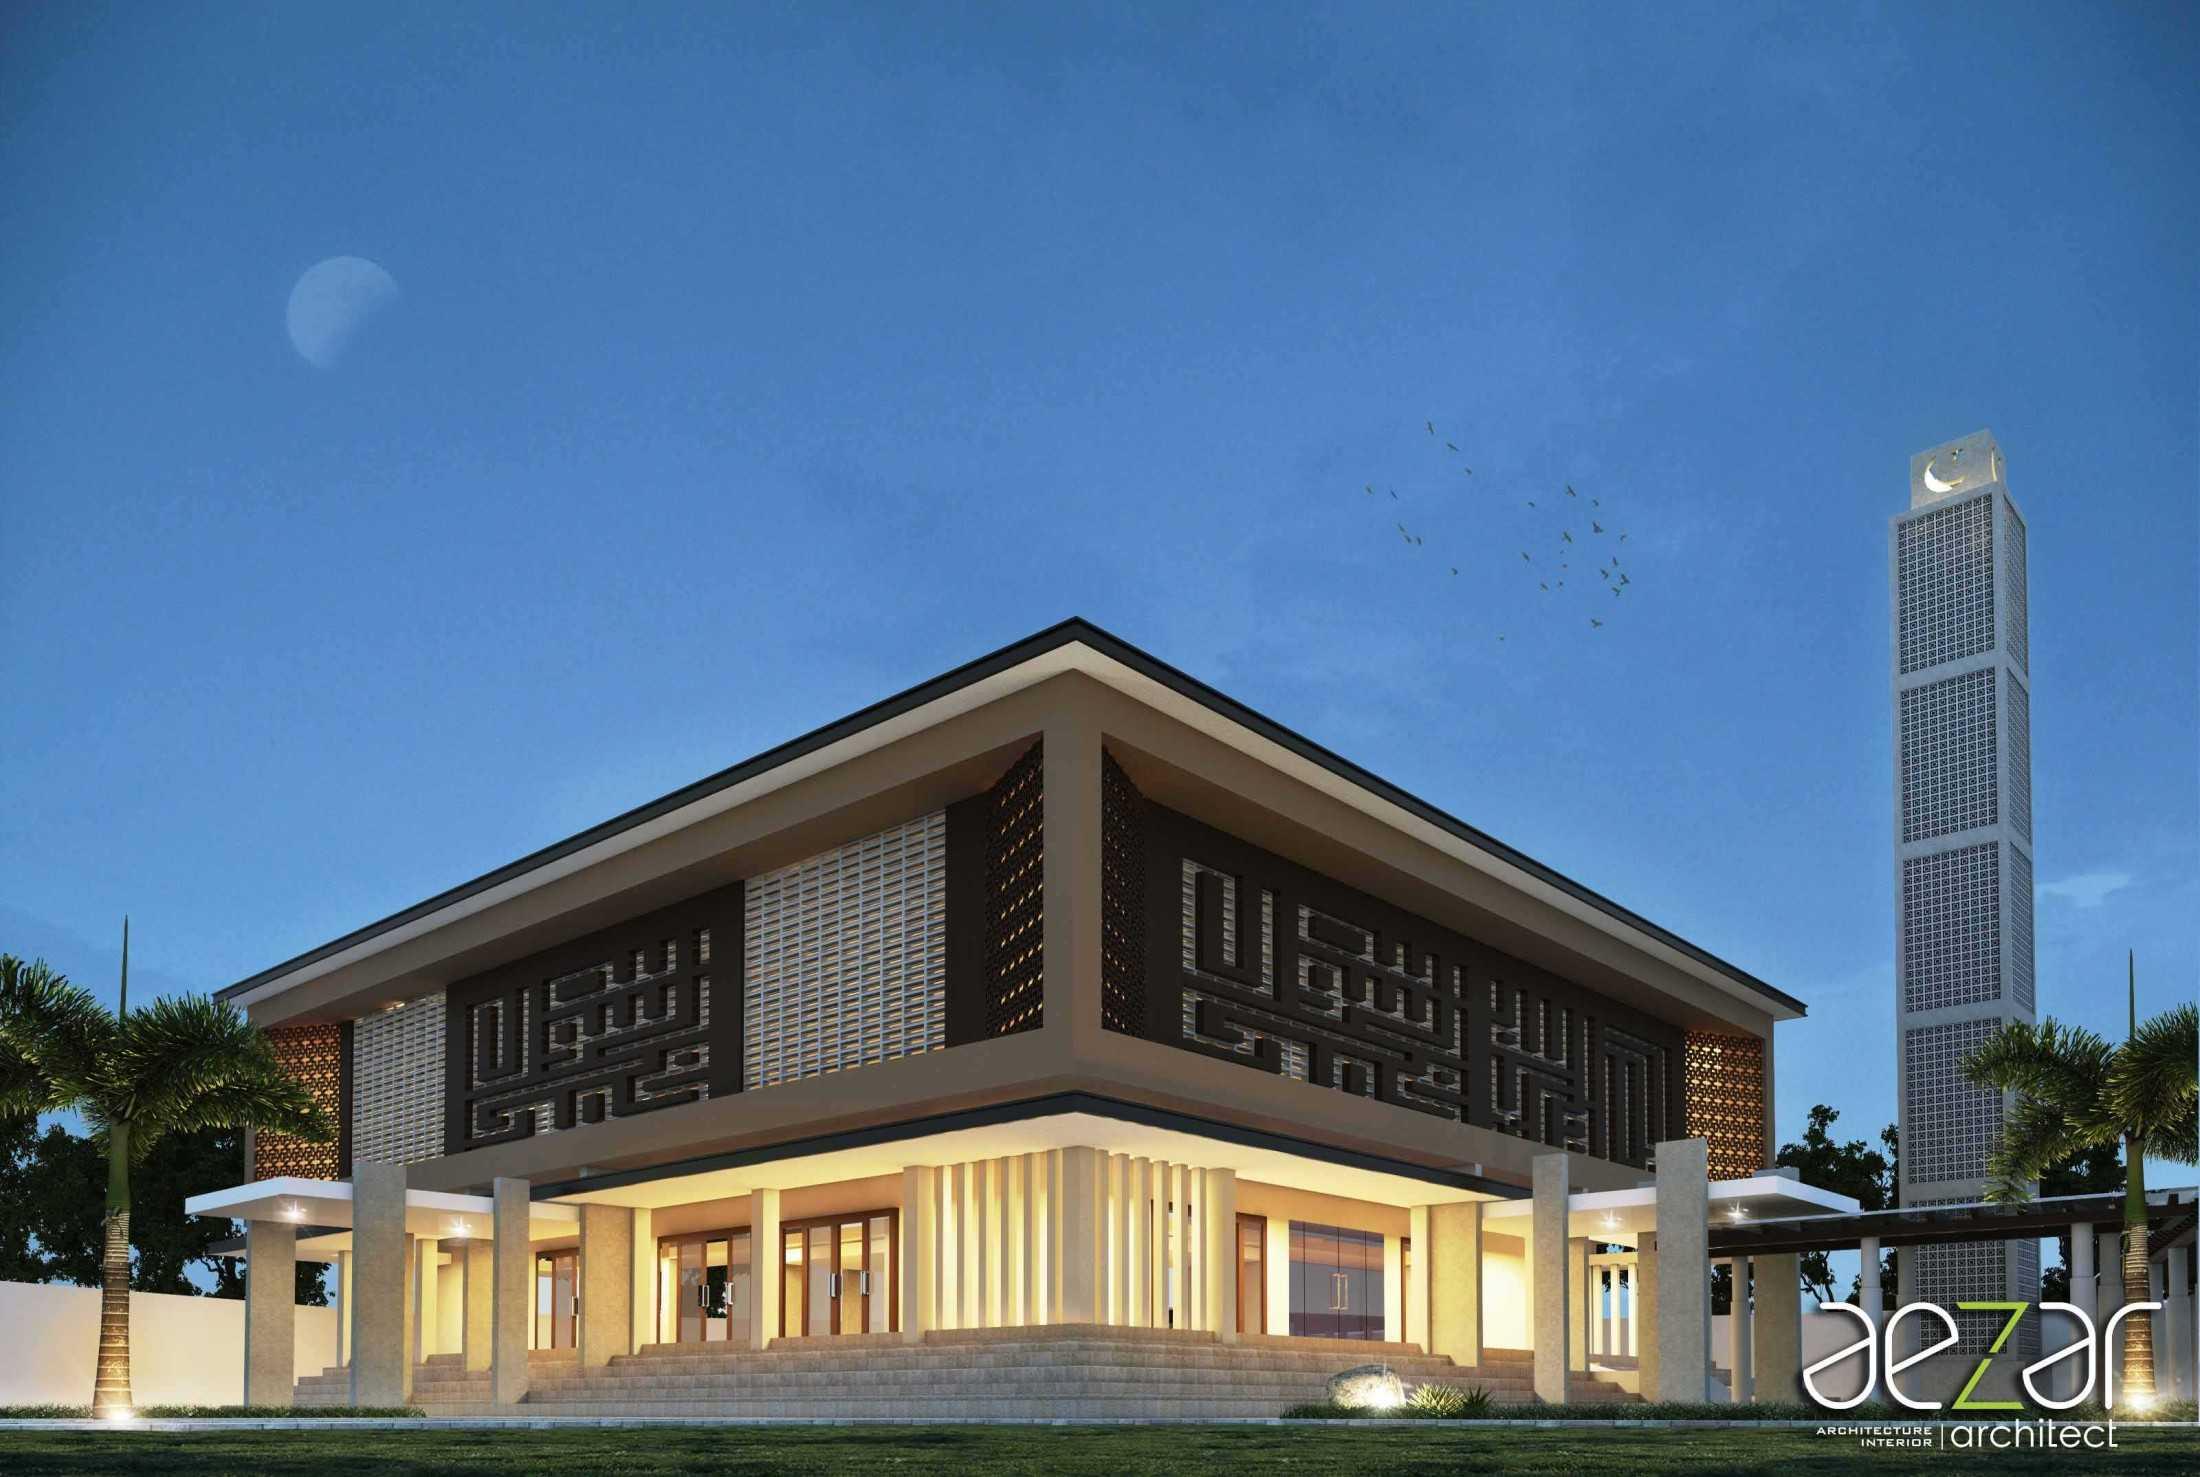 Jasa Arsitek Aezar Architect di Cilacap